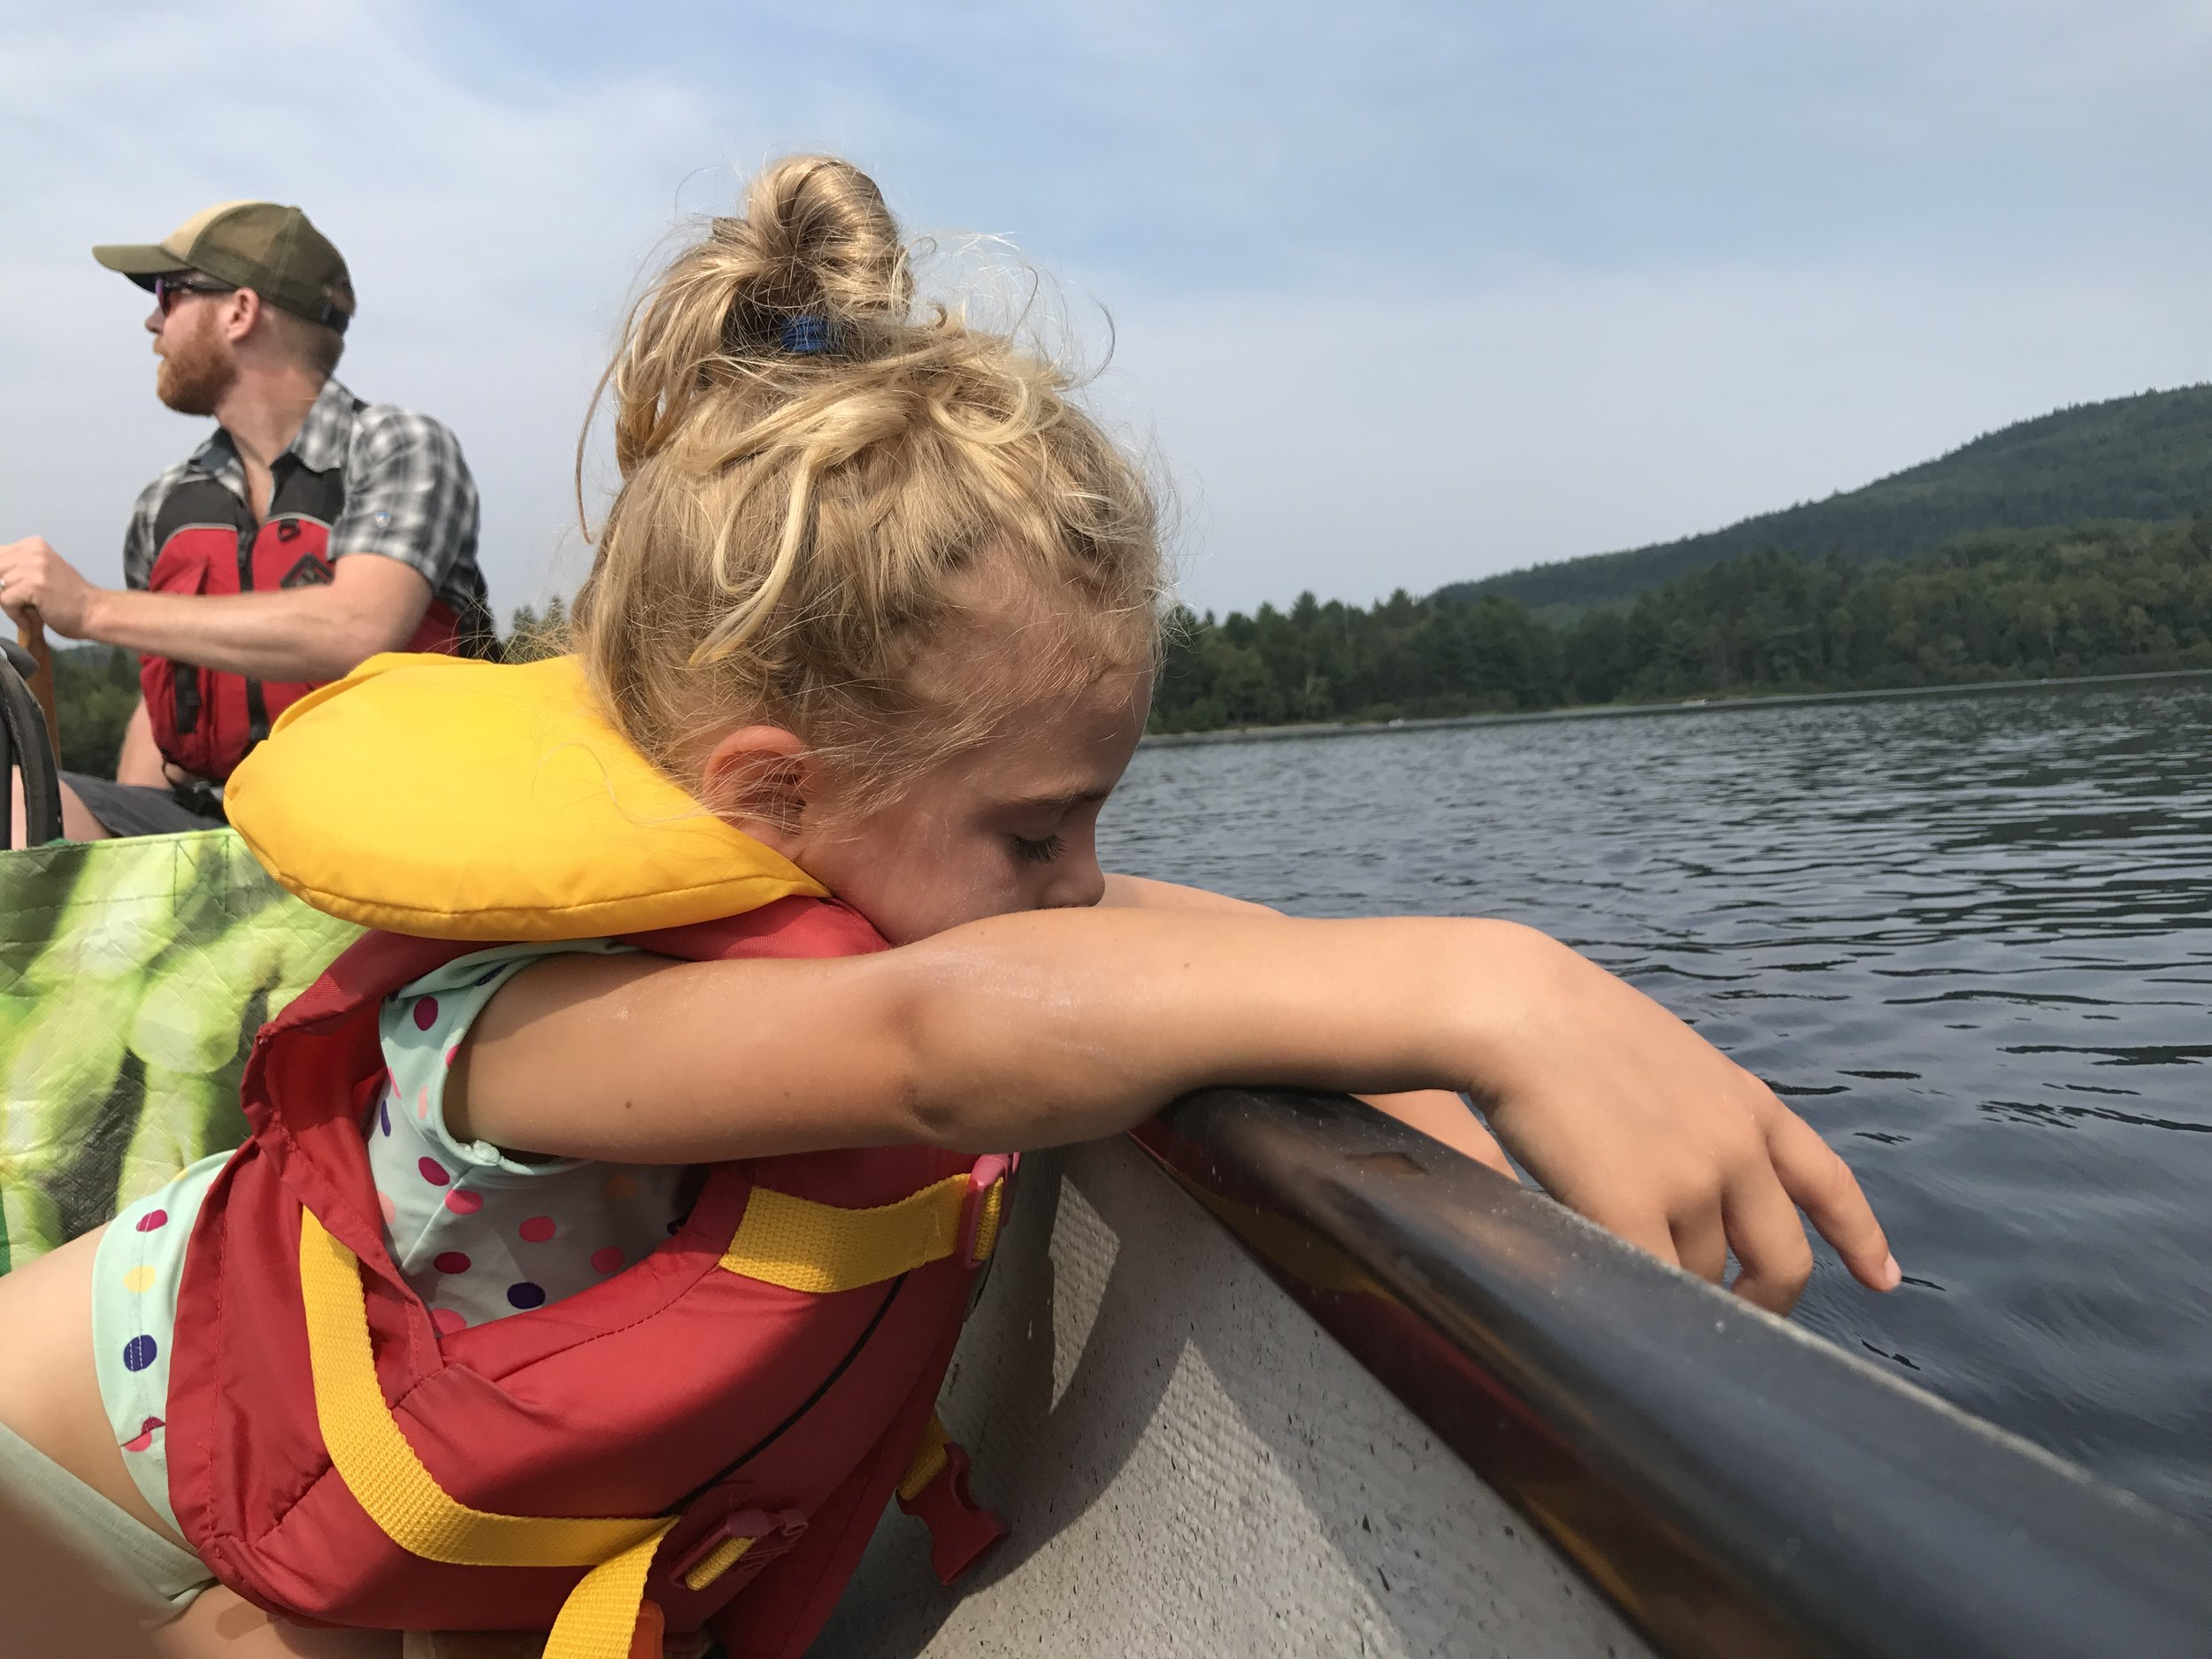 Feeling the water over the canoe's edge.